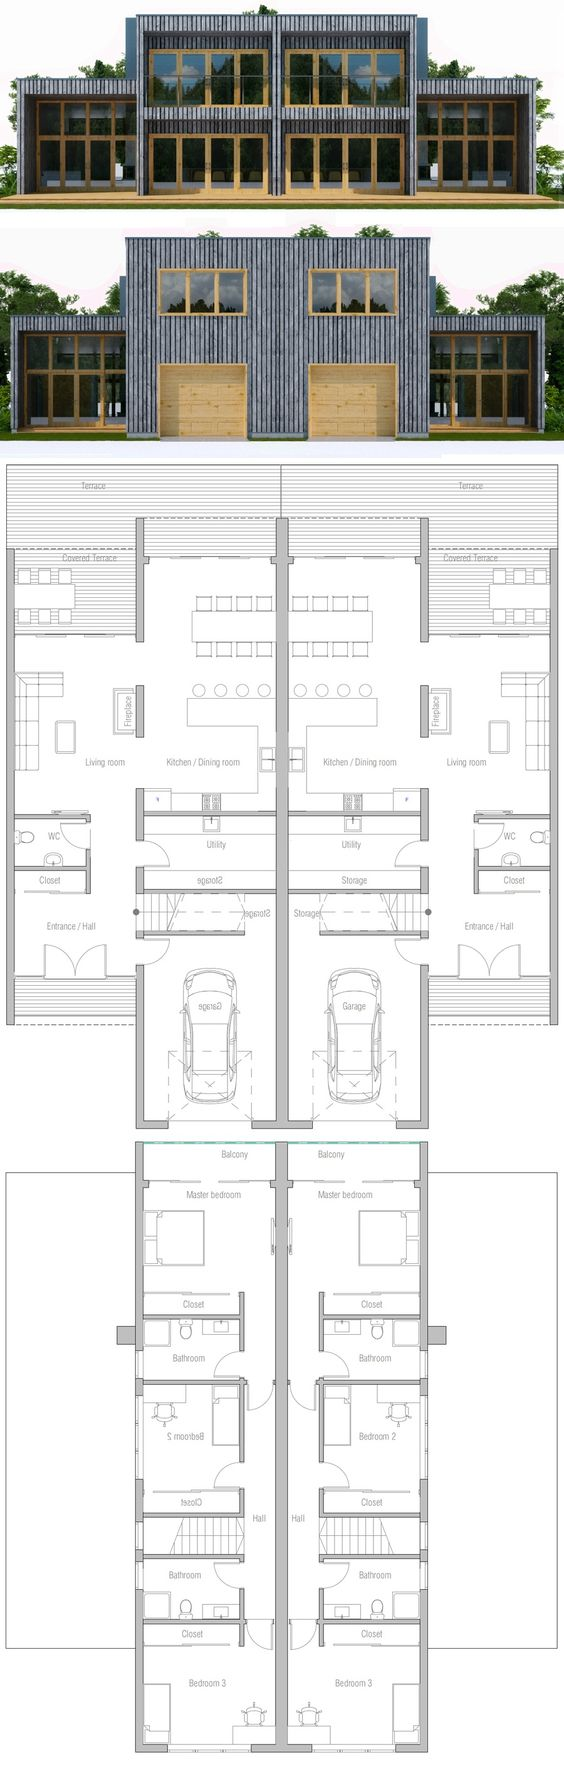 best 20 duplex house ideas on pinterest duplex house design best 20 duplex house ideas on pinterest duplex house design duplex house plans and duplex design